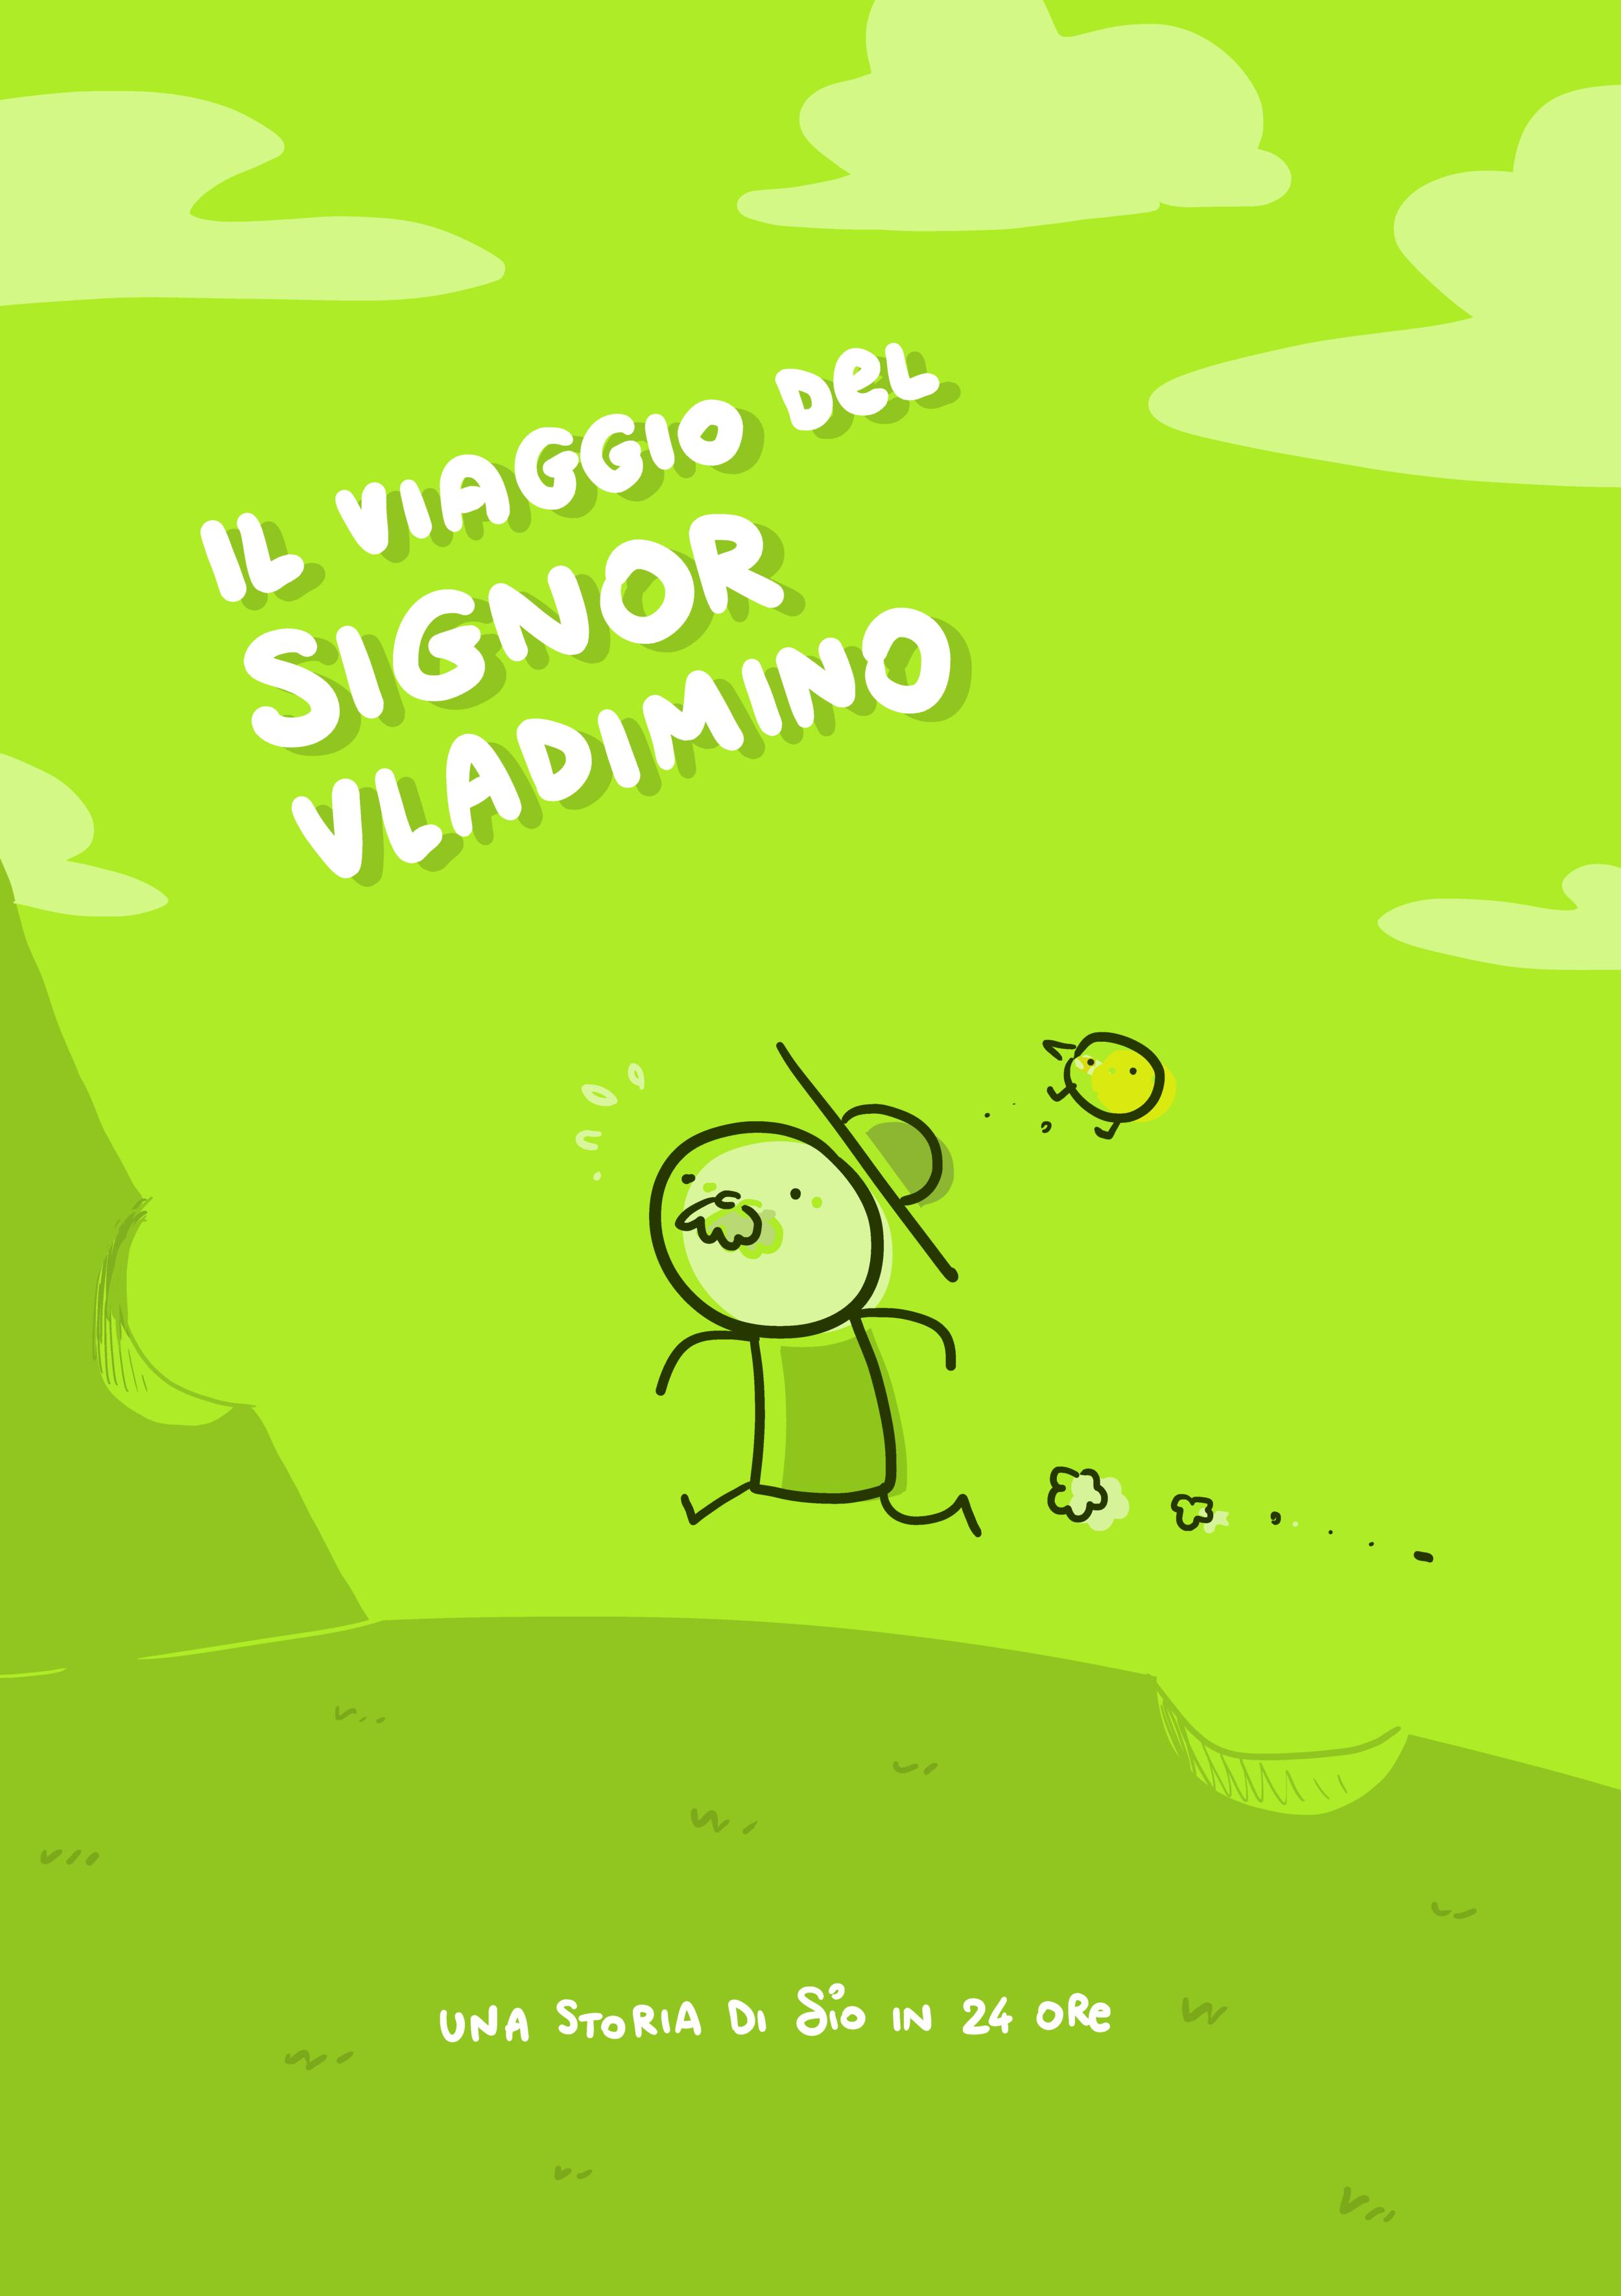 Vladimino_000.png